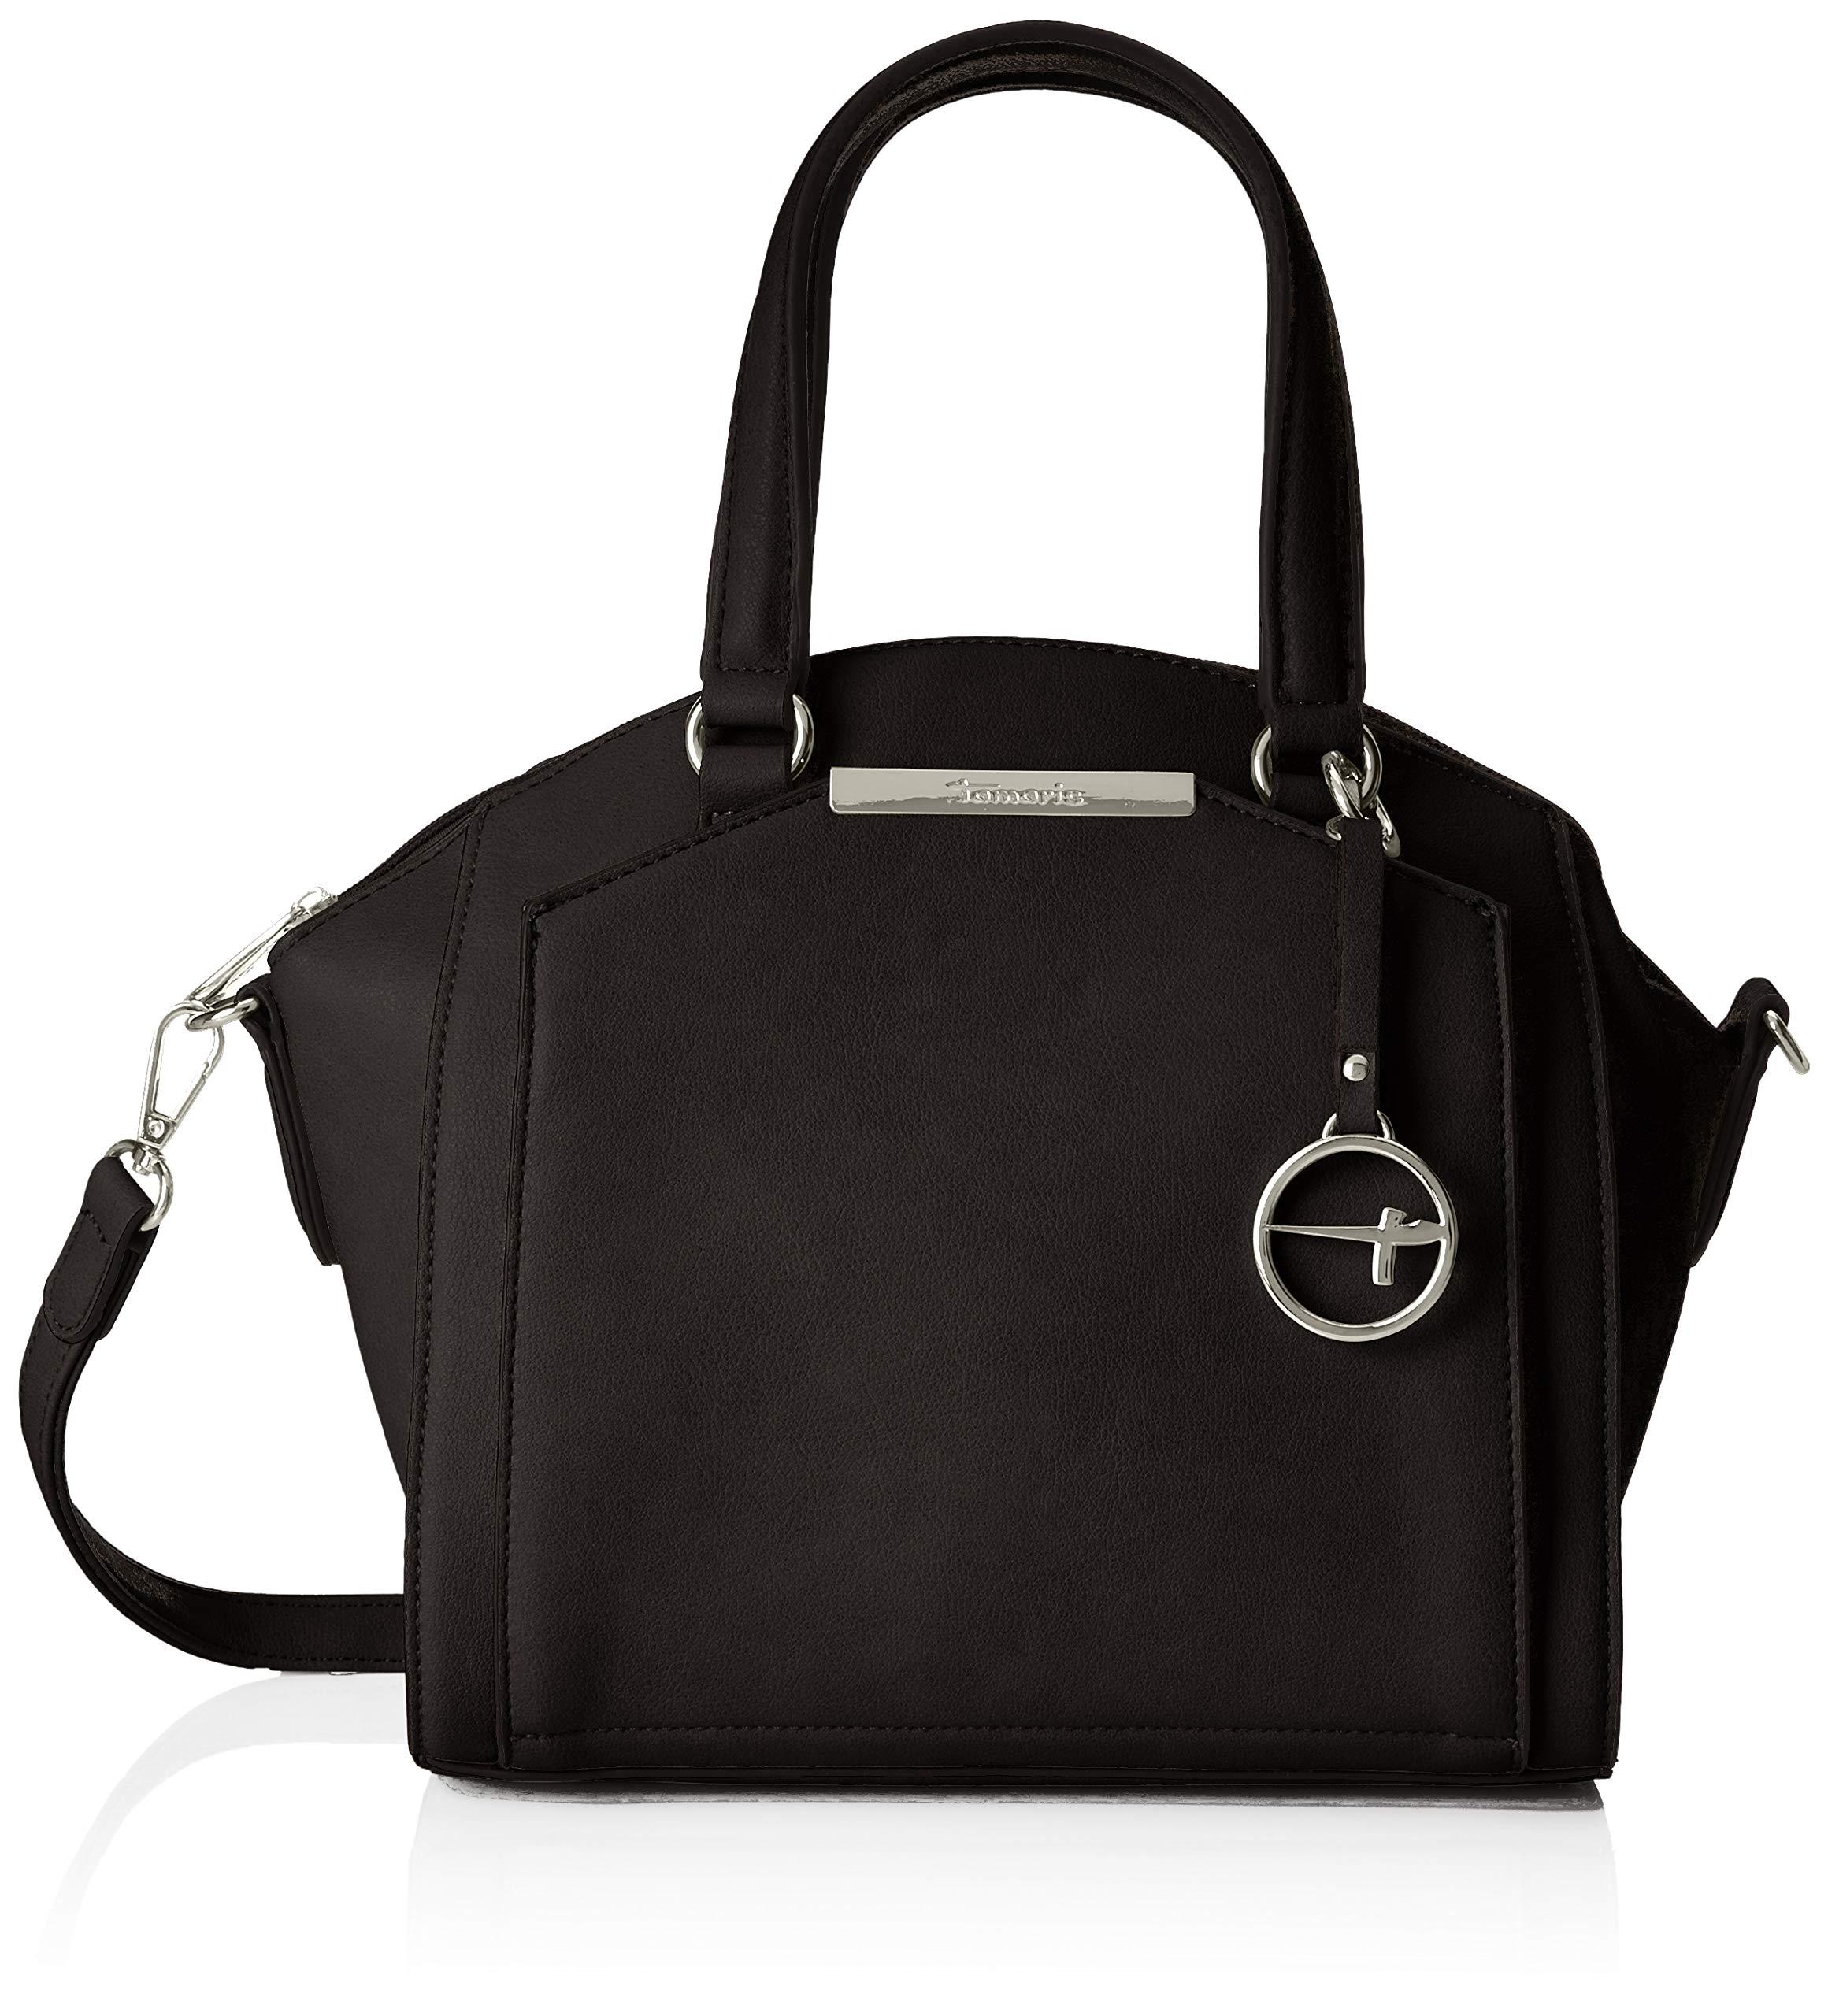 X Cmw Mirela L HandbagSac FemmeNoirblack13x22x27 Tamaris H BodxeC